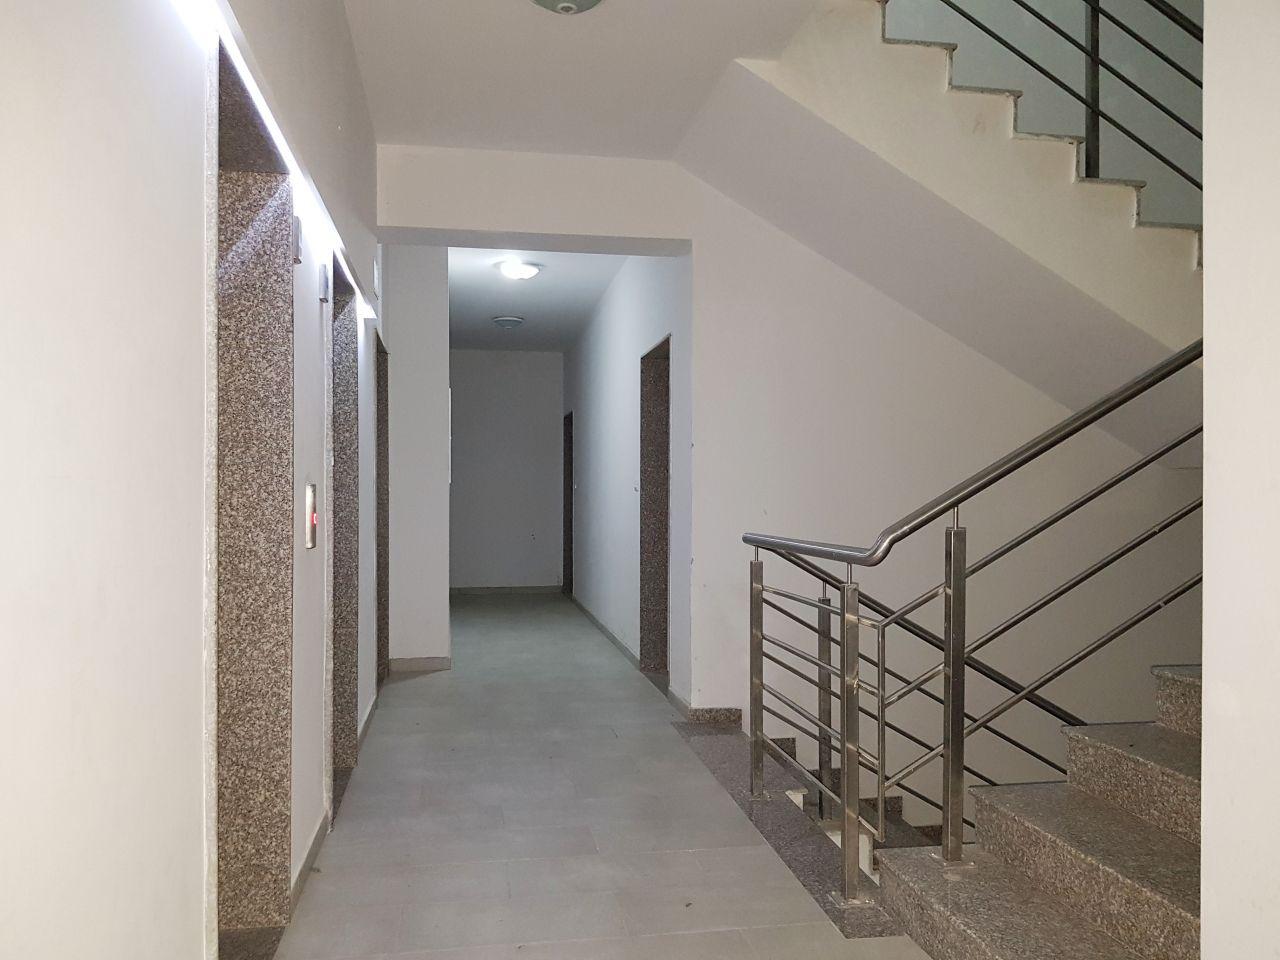 7 Kika Complex, Rruga Tish Dahija, Tirane 1021